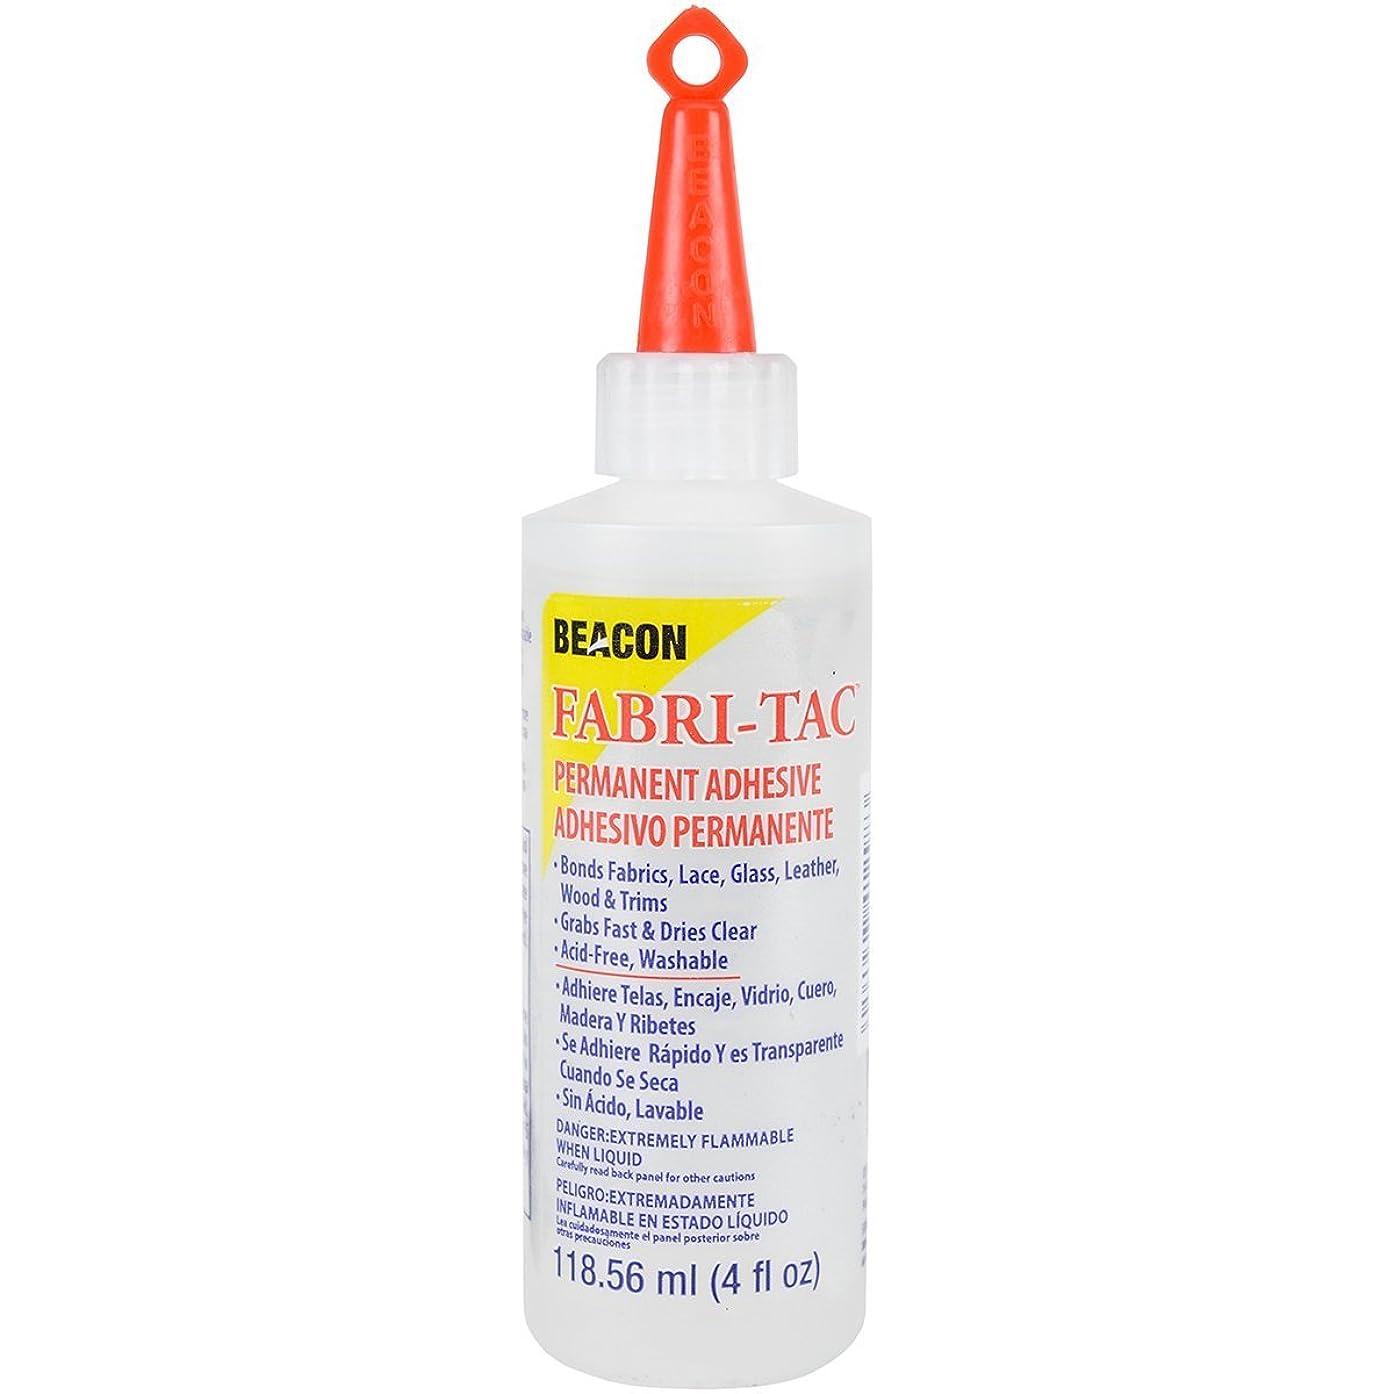 Beacon Fabri-Tac Permanent Adhesive, 4 Ounce THE GLUE GUN IN A BOTTLE !